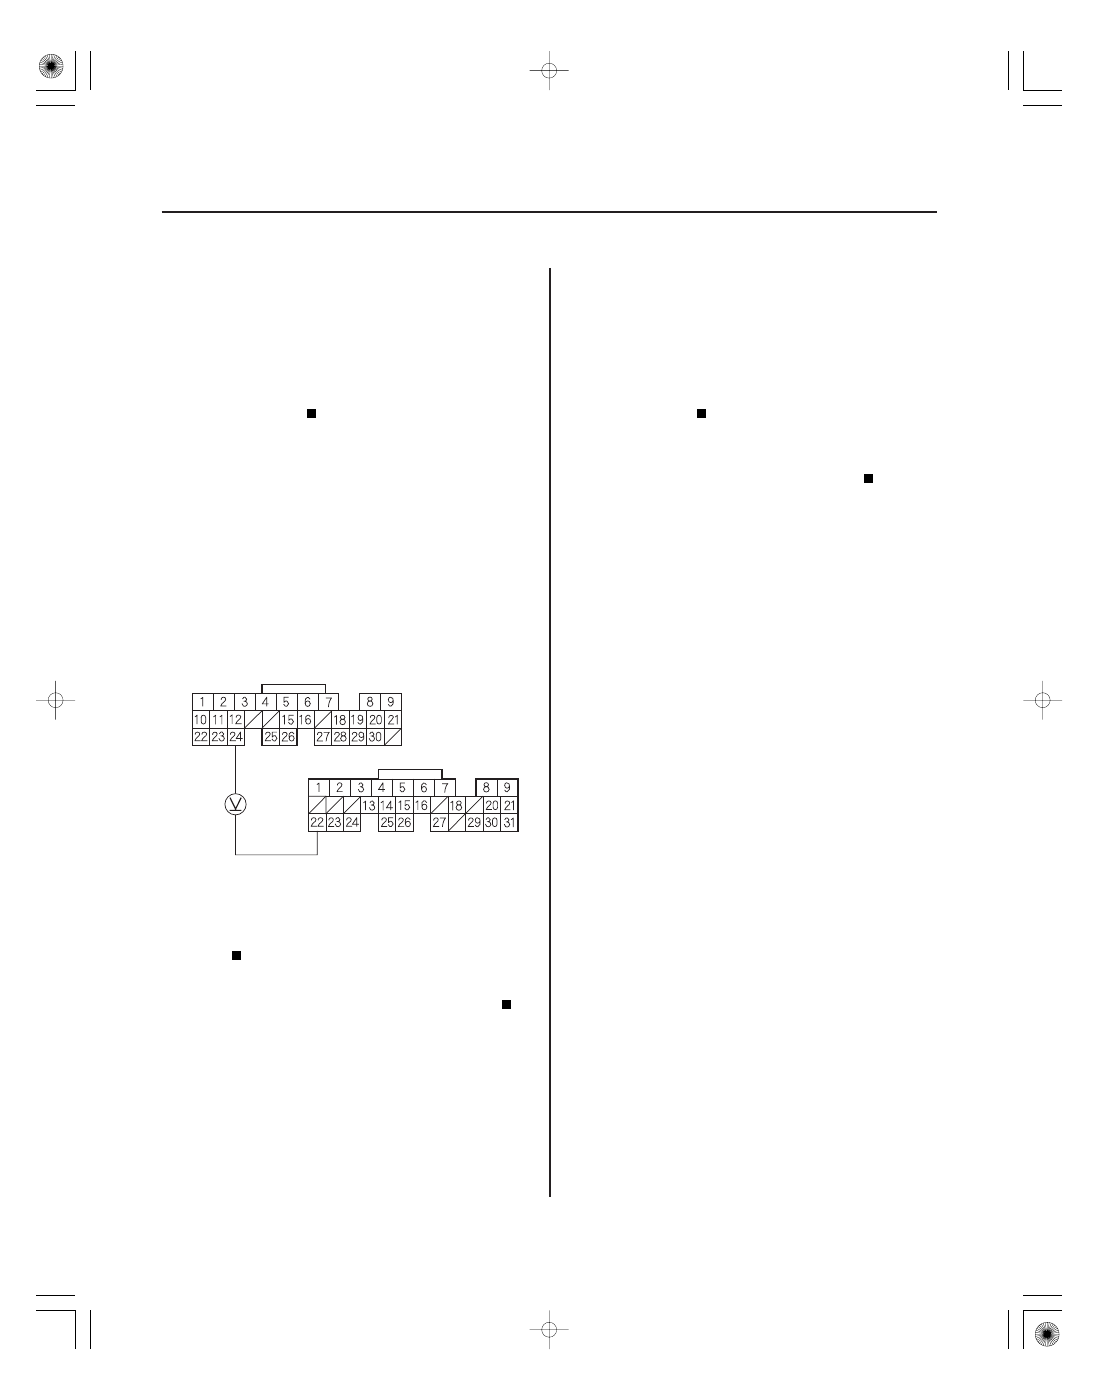 Acura Rsx Honda Integra Manual Part 160 K20a2 Ecu Wiring Diagram